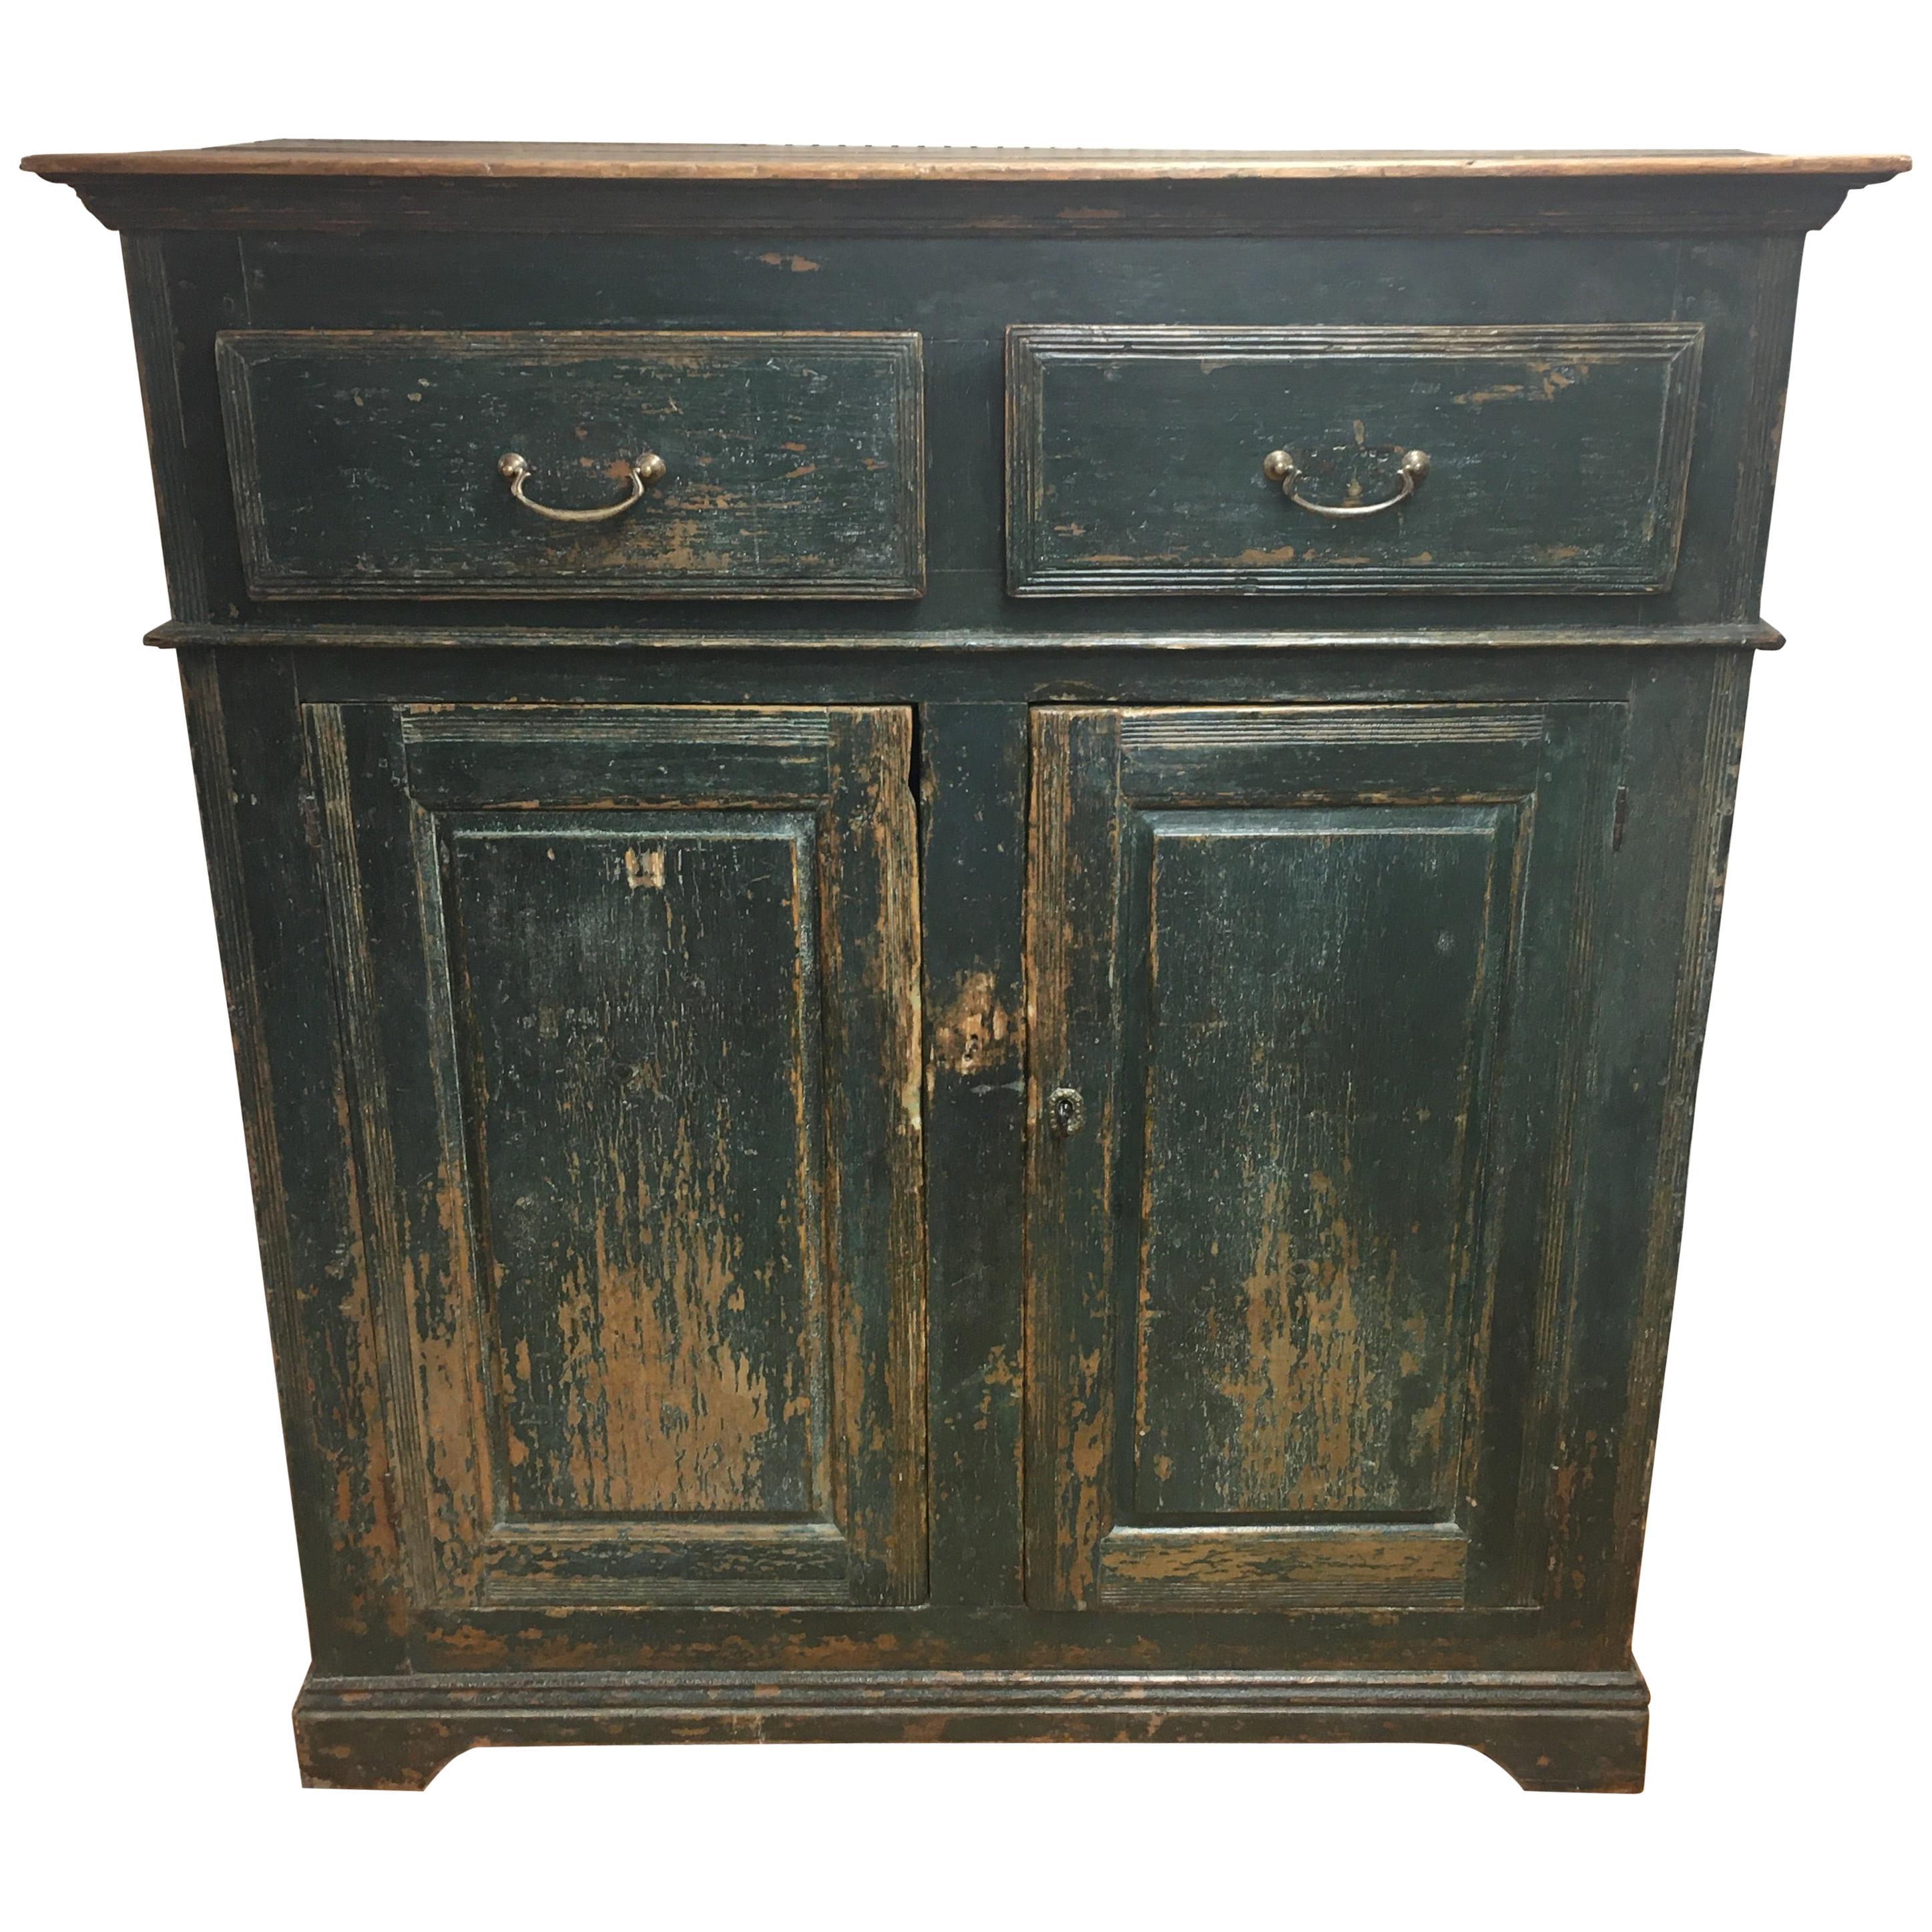 Original Painted Canadian 2 Door, 2 Drawer Large Buffet